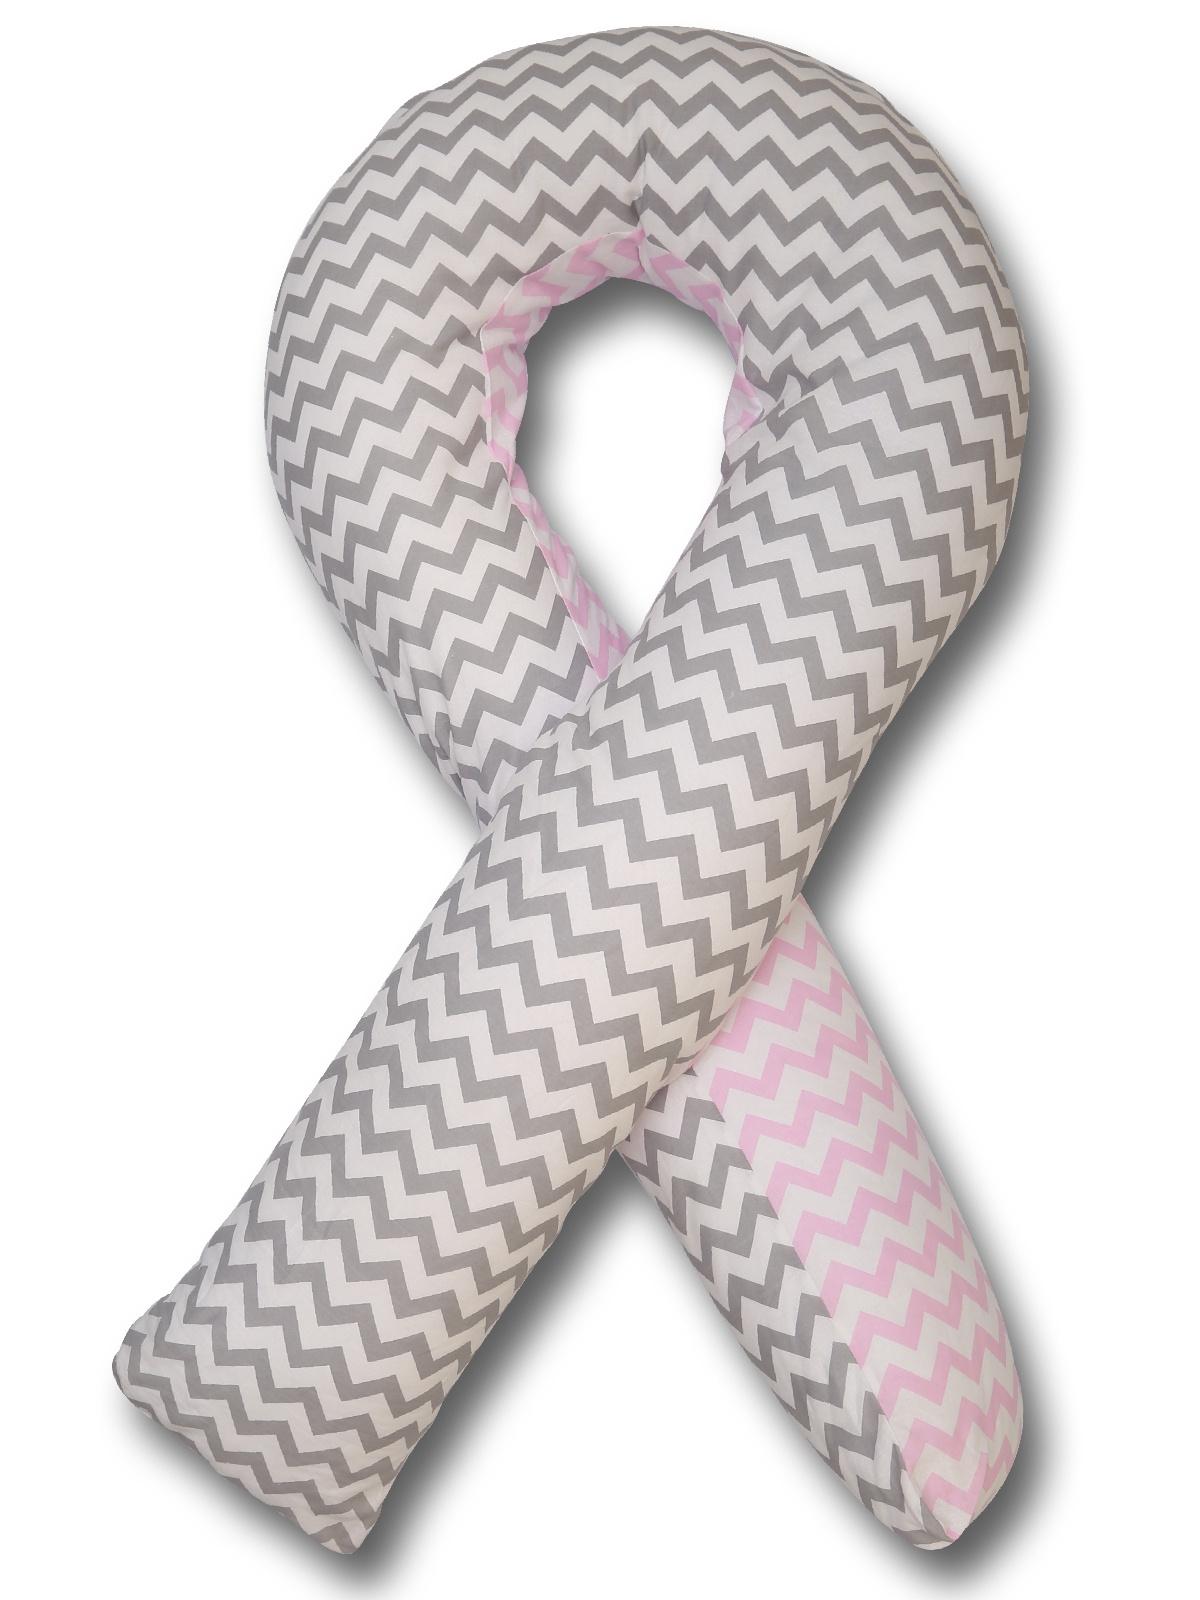 Чехол для подушки для беременных Body Pillow форма U зигзаг комби, серый, розовый body pillow чехол для подушки для беременных u образный цвет бежевый золотой